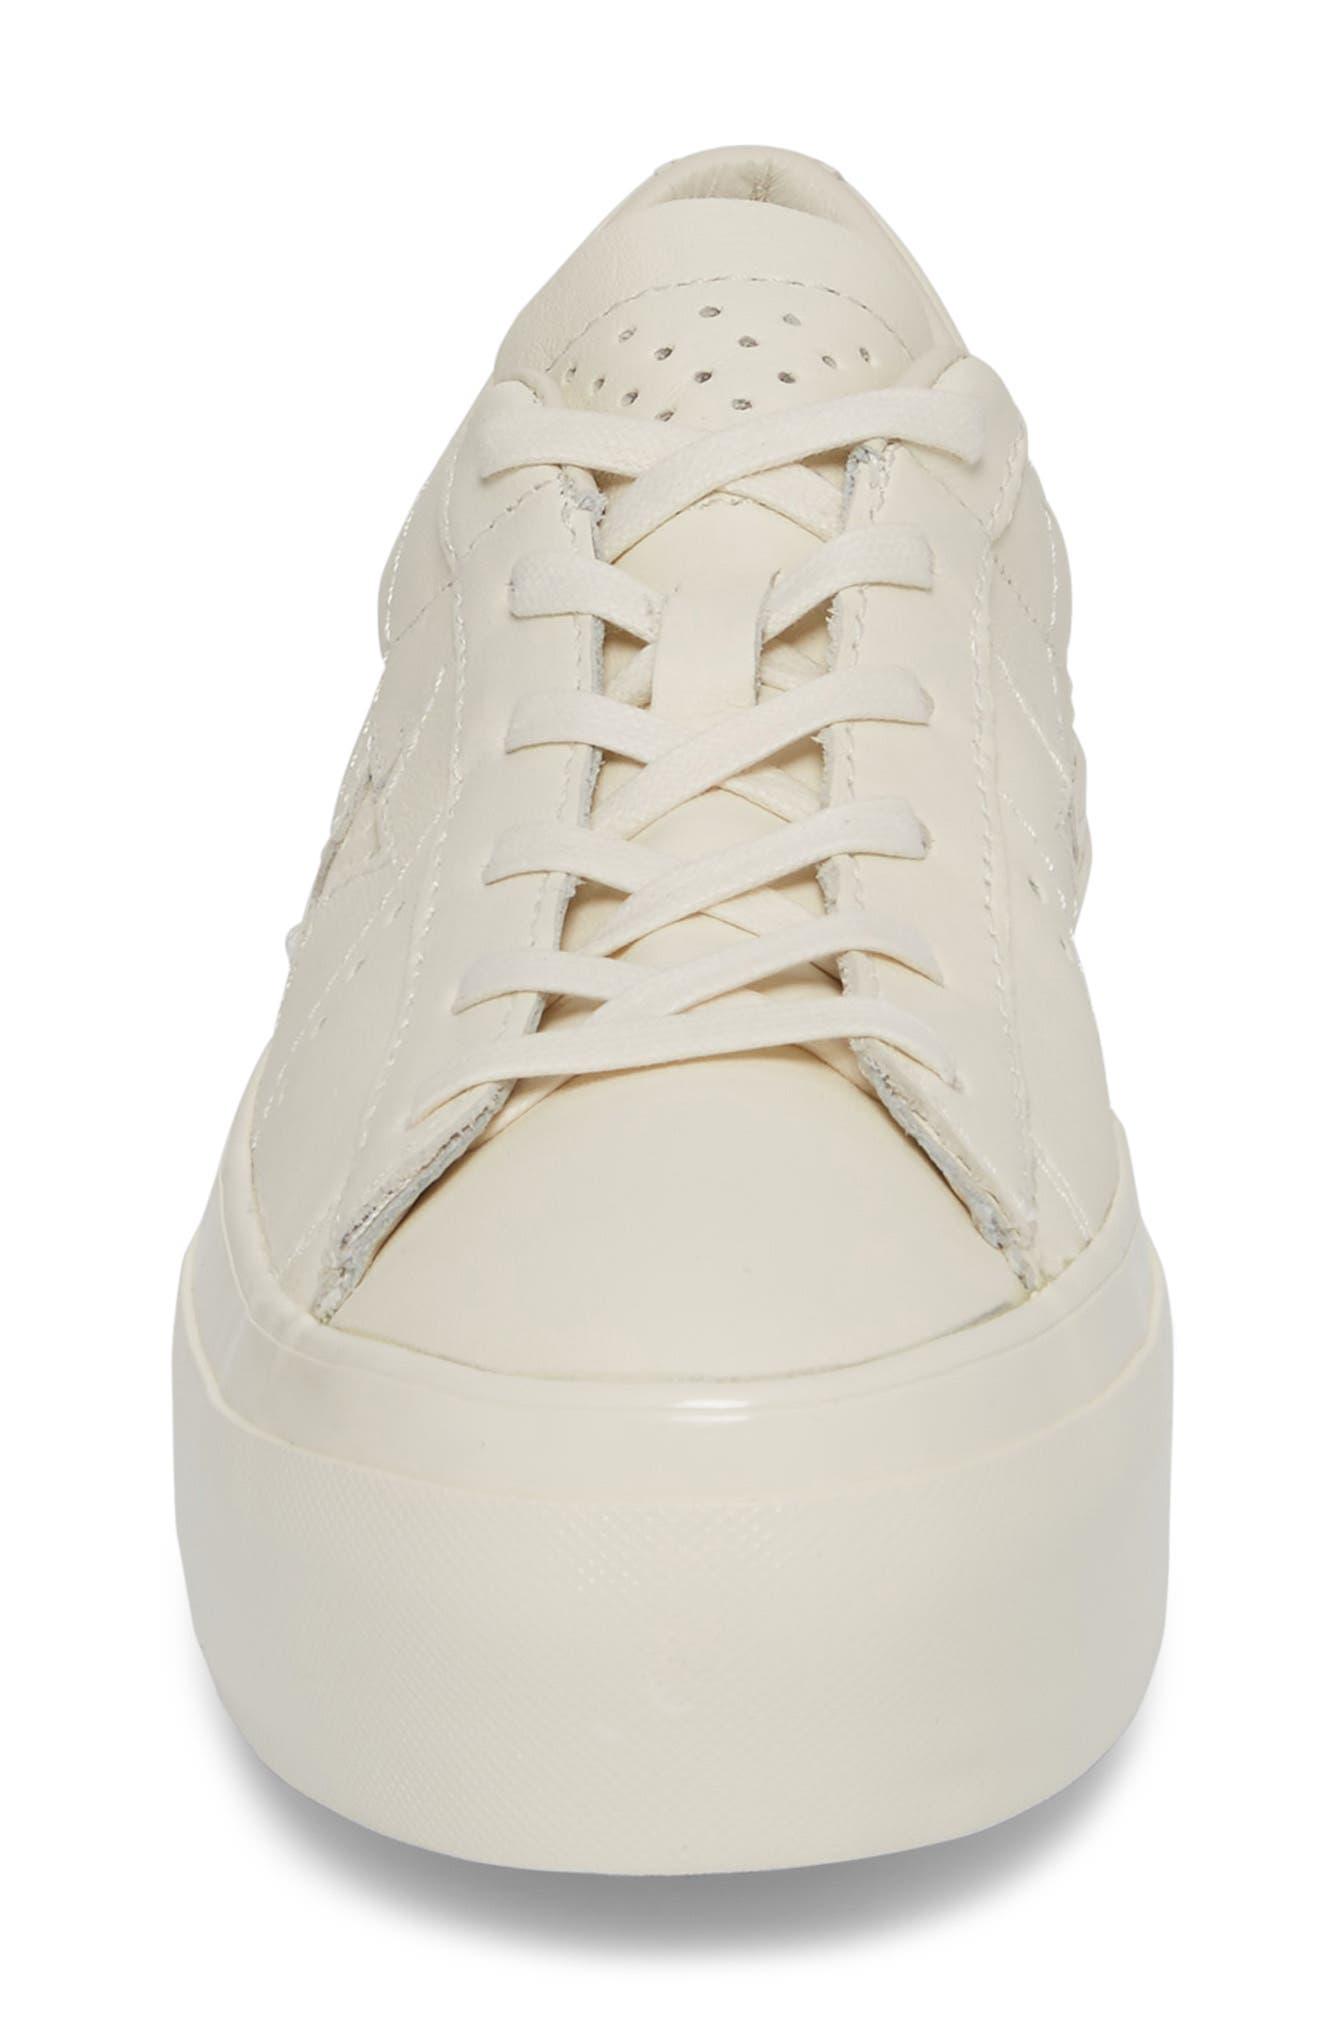 Chuck Taylor<sup>®</sup> All Star<sup>®</sup> One Star Platform Sneaker,                             Alternate thumbnail 4, color,                             Egret/ Egret